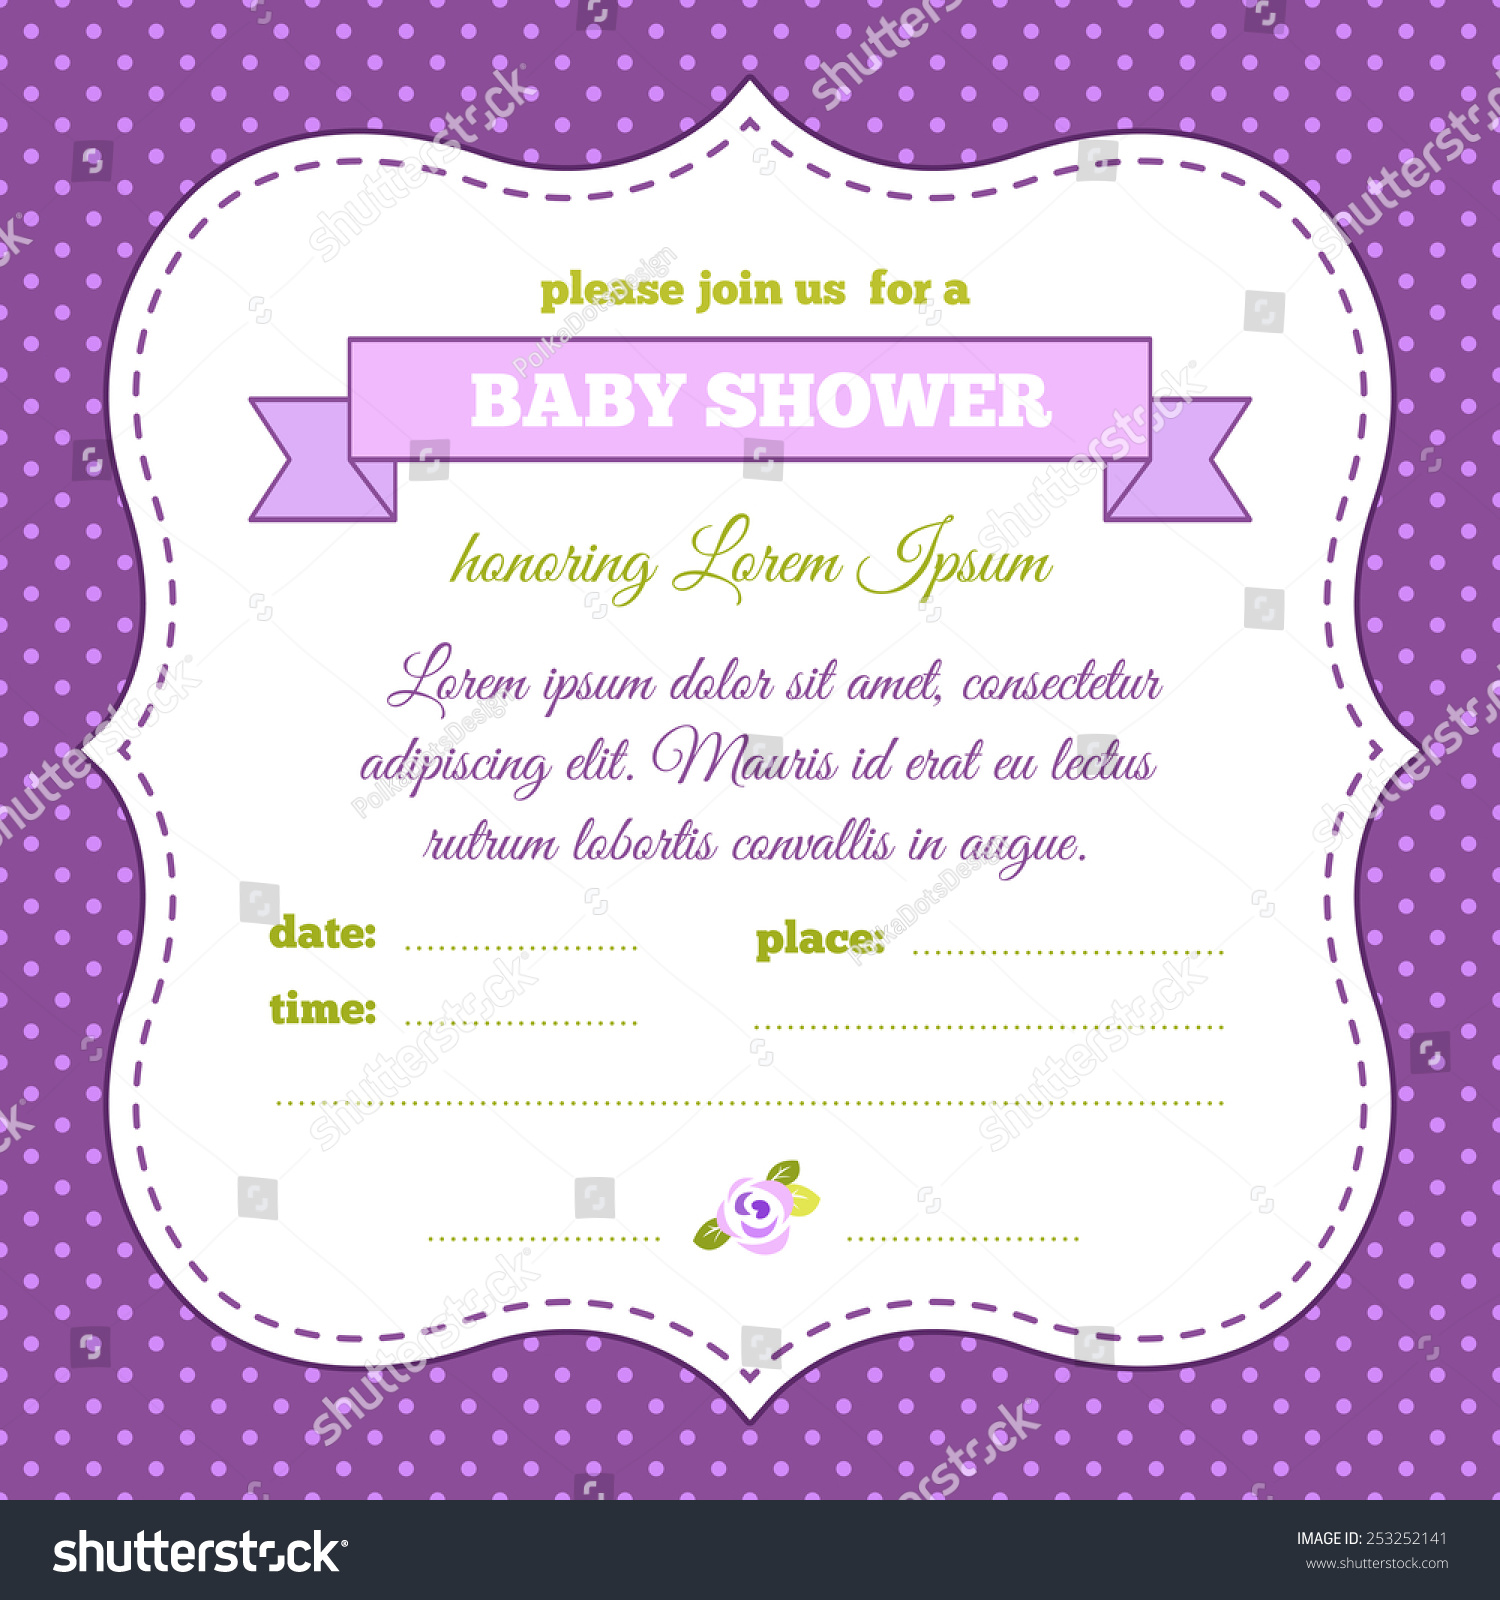 Baby shower invitation vintage frame polka stock vector royalty baby shower invitation vintage frame polka dot background purple and green colors filmwisefo